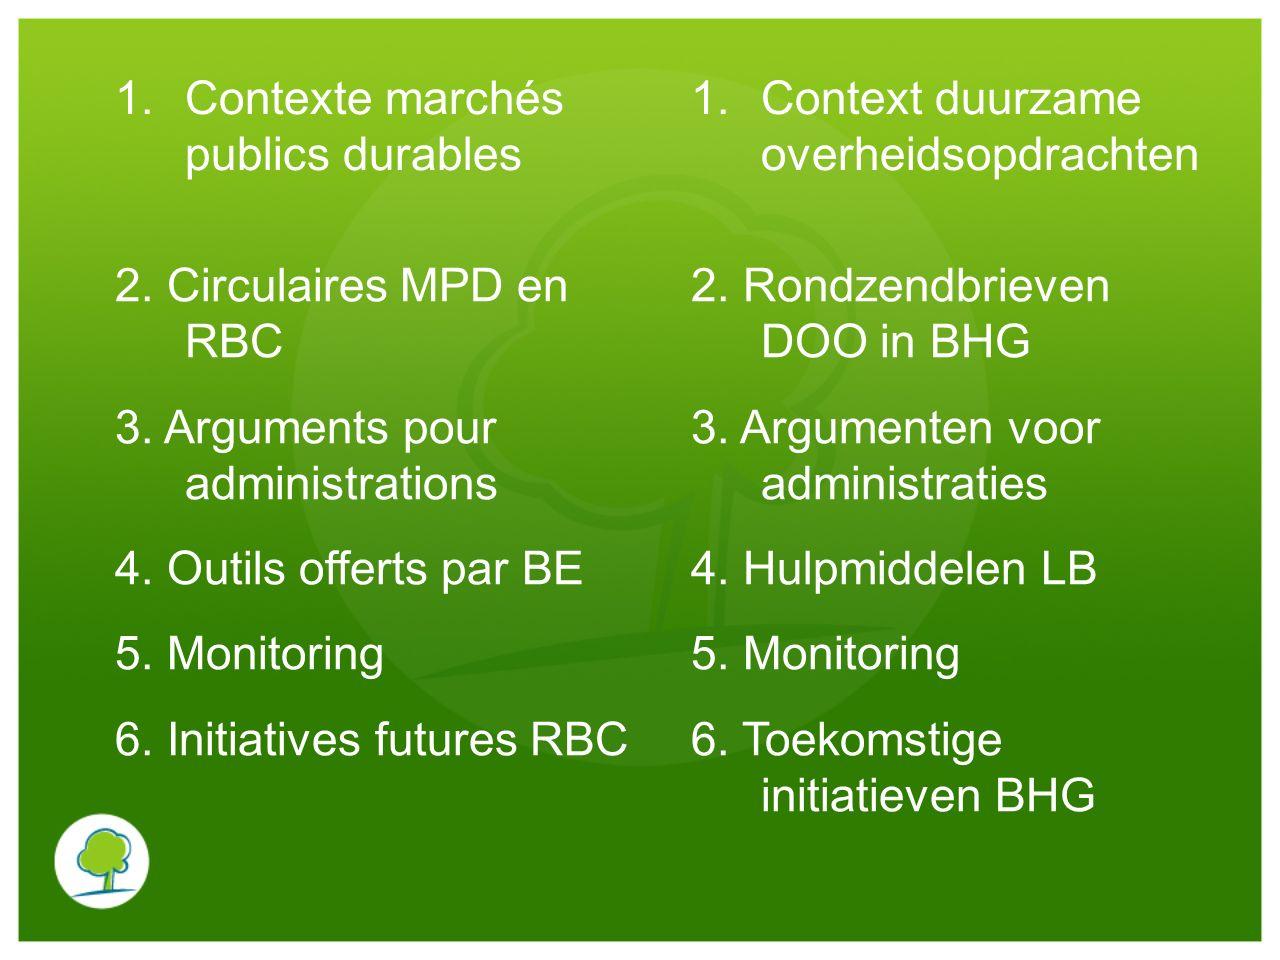 Contexte marchés publics durables